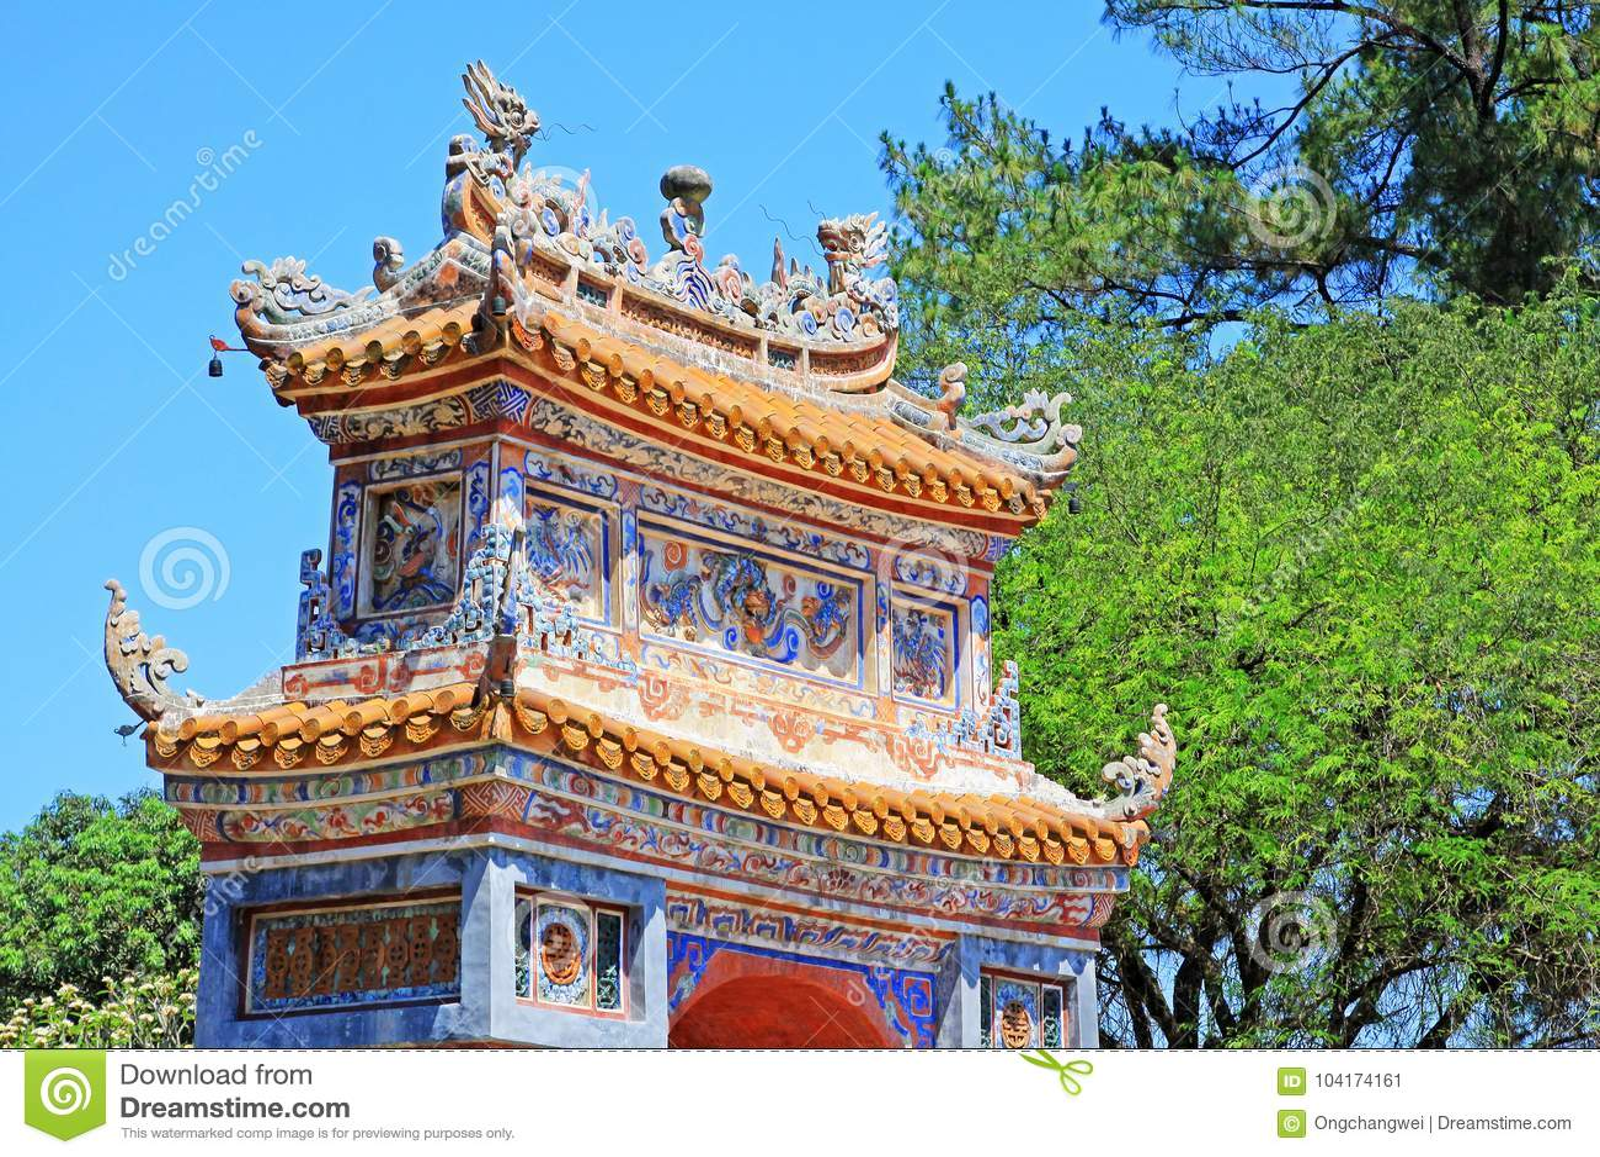 Hue Imperial Tomb of Tu Duc, Vietnam UNESCO World Heritage Site